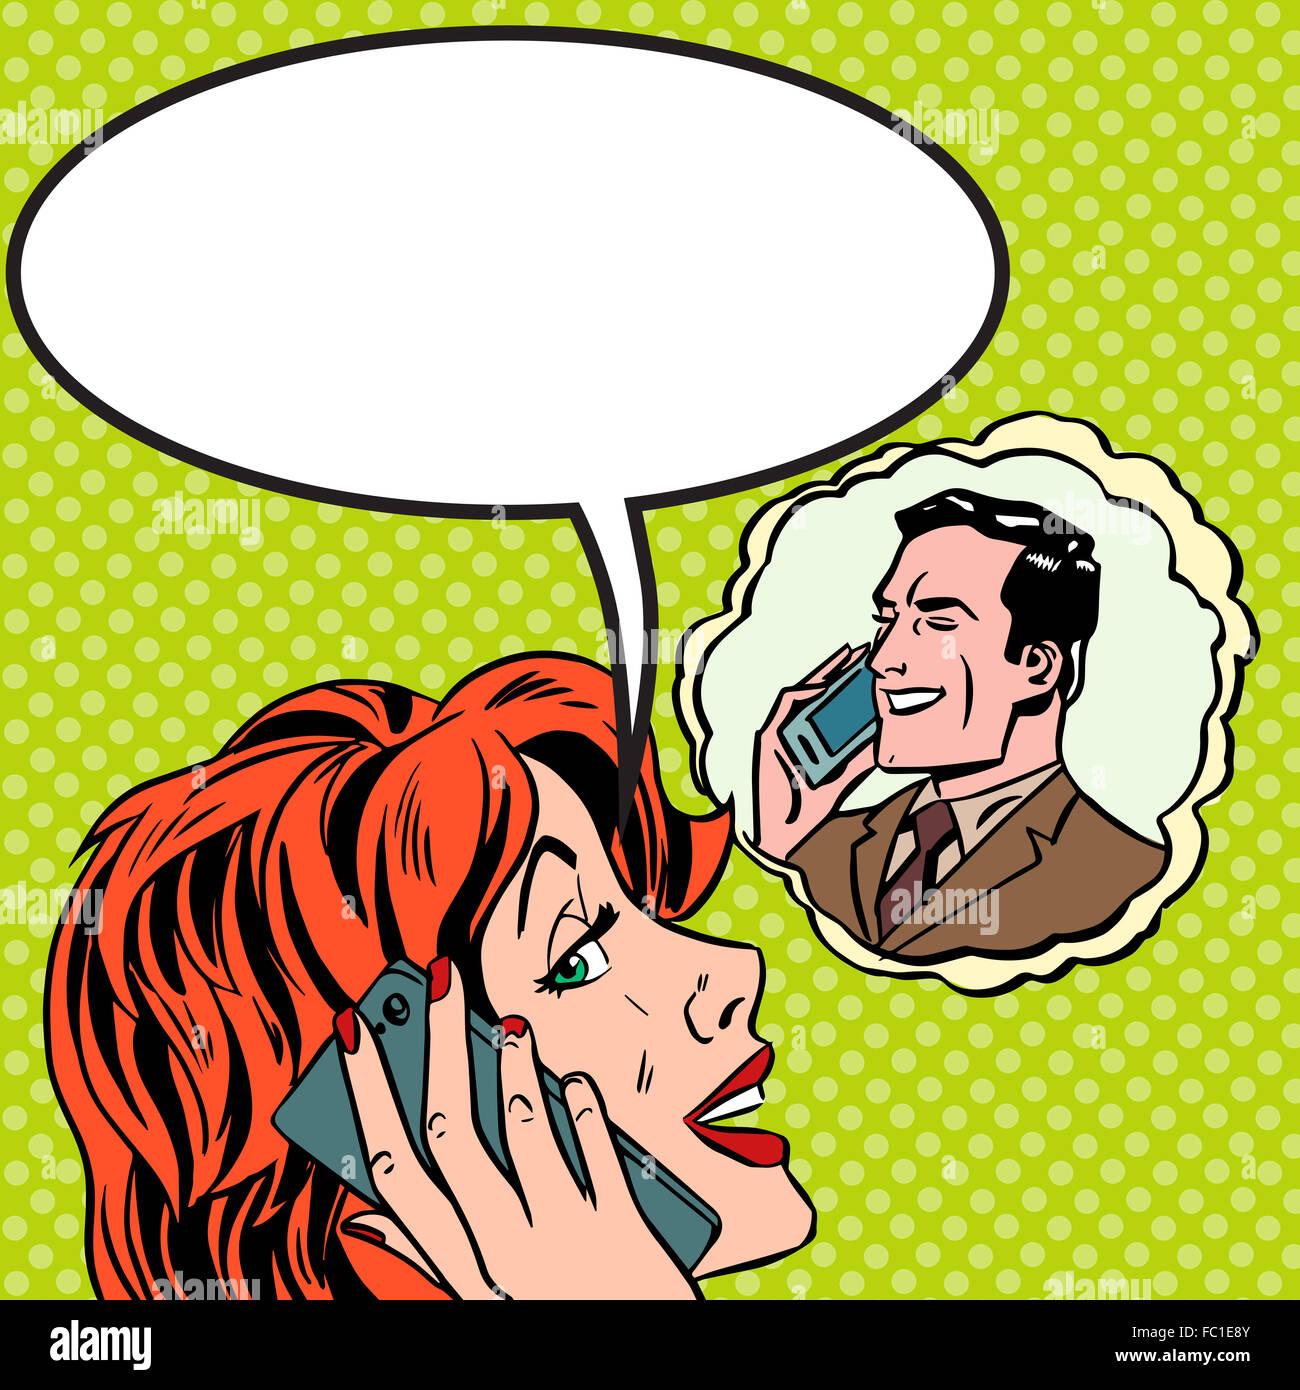 Woman man phone talk Pop art vintage comic Stock Photo